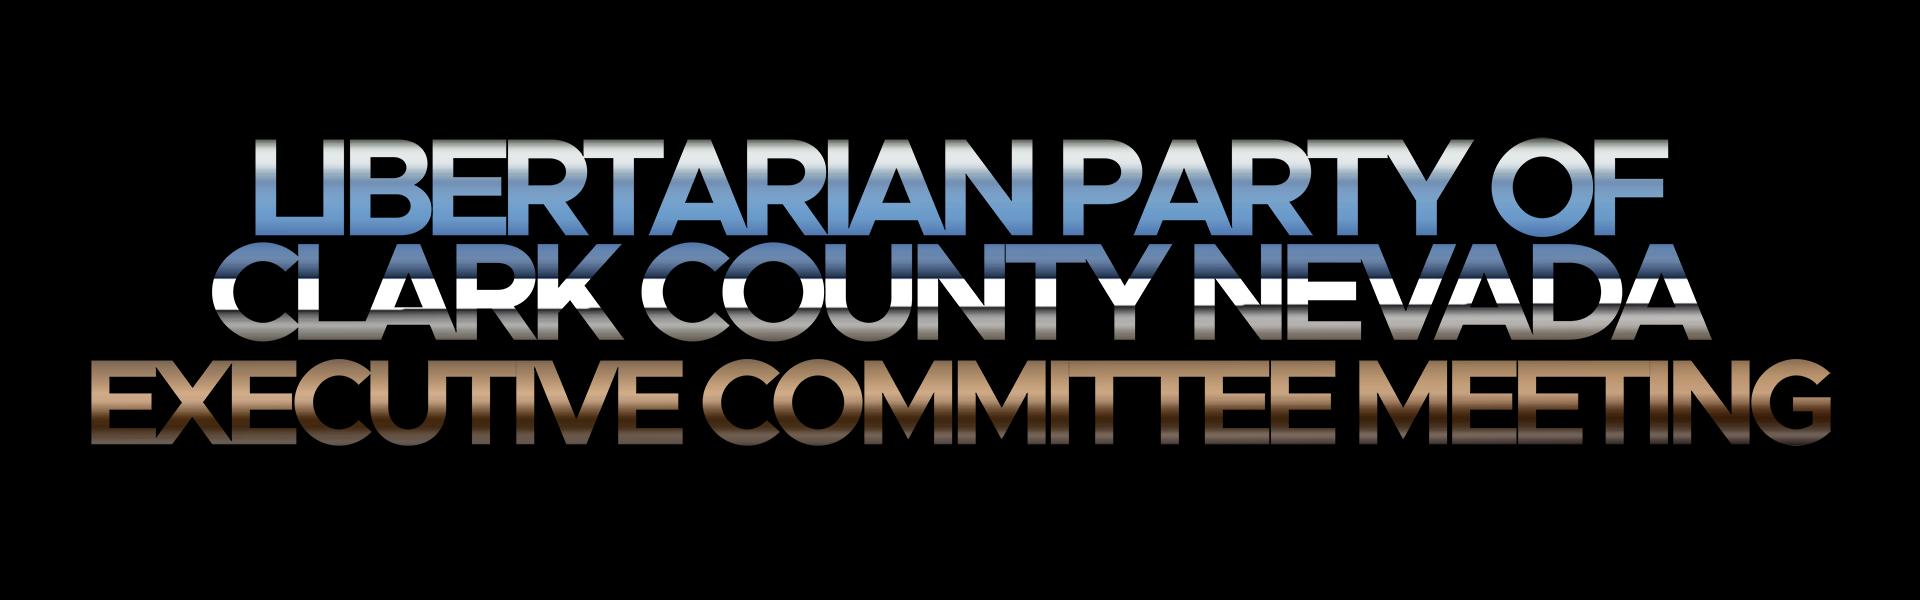 LPCCNV Executive Committee Meeting